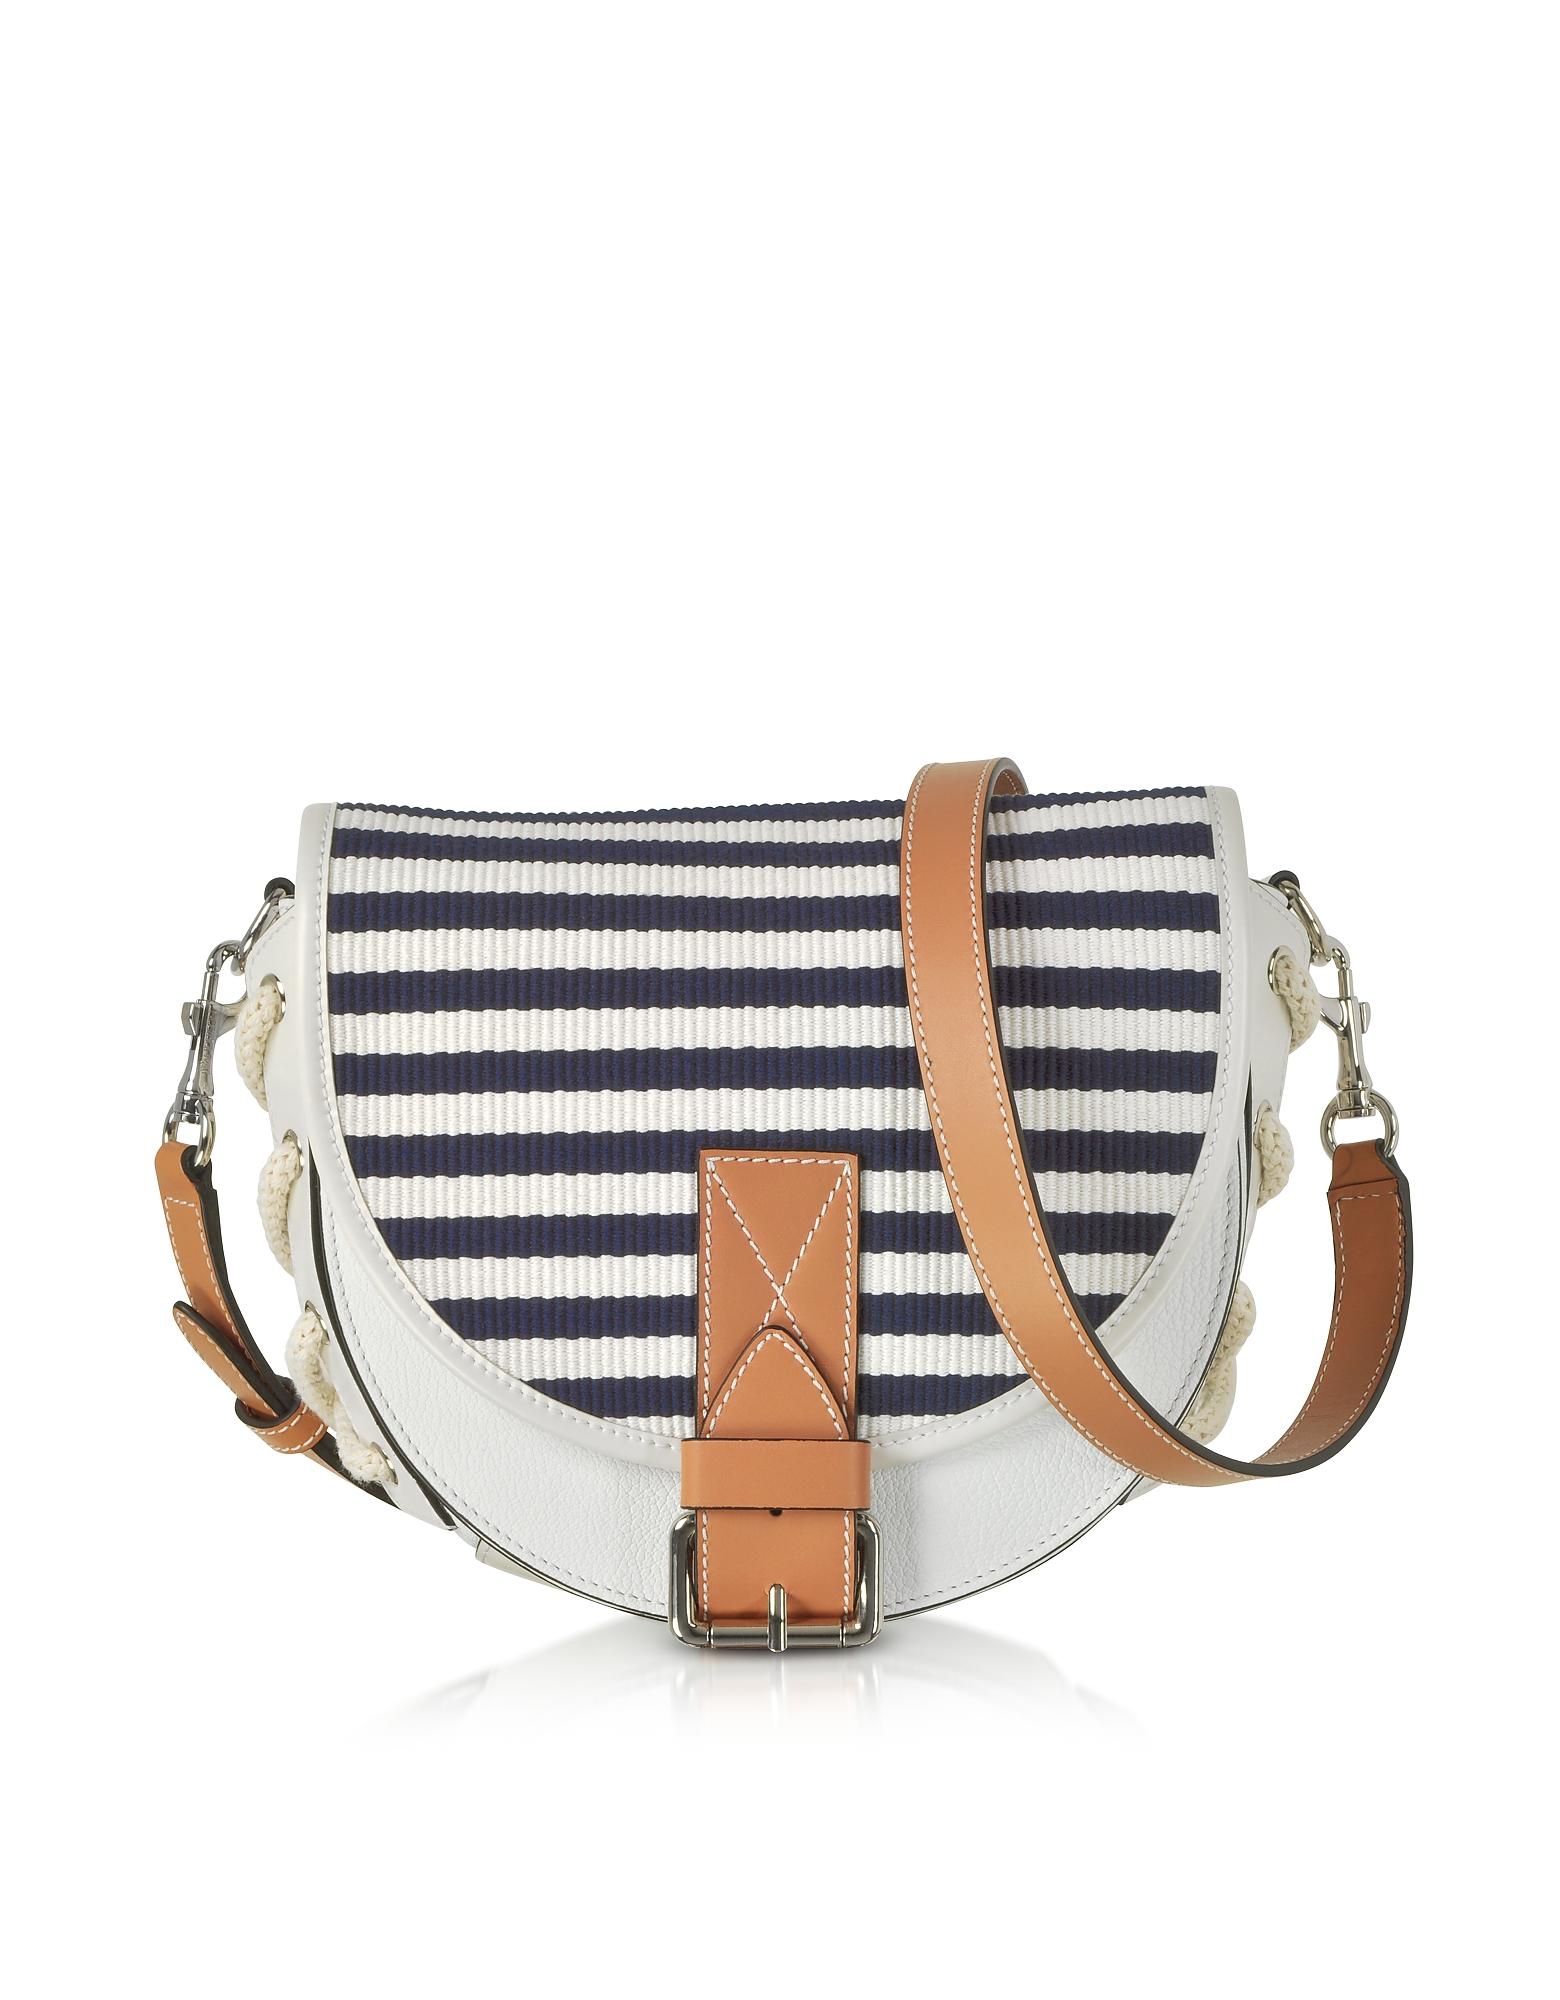 JW Anderson Handbags, Small Bike Striped Canvas Shoulder Bag